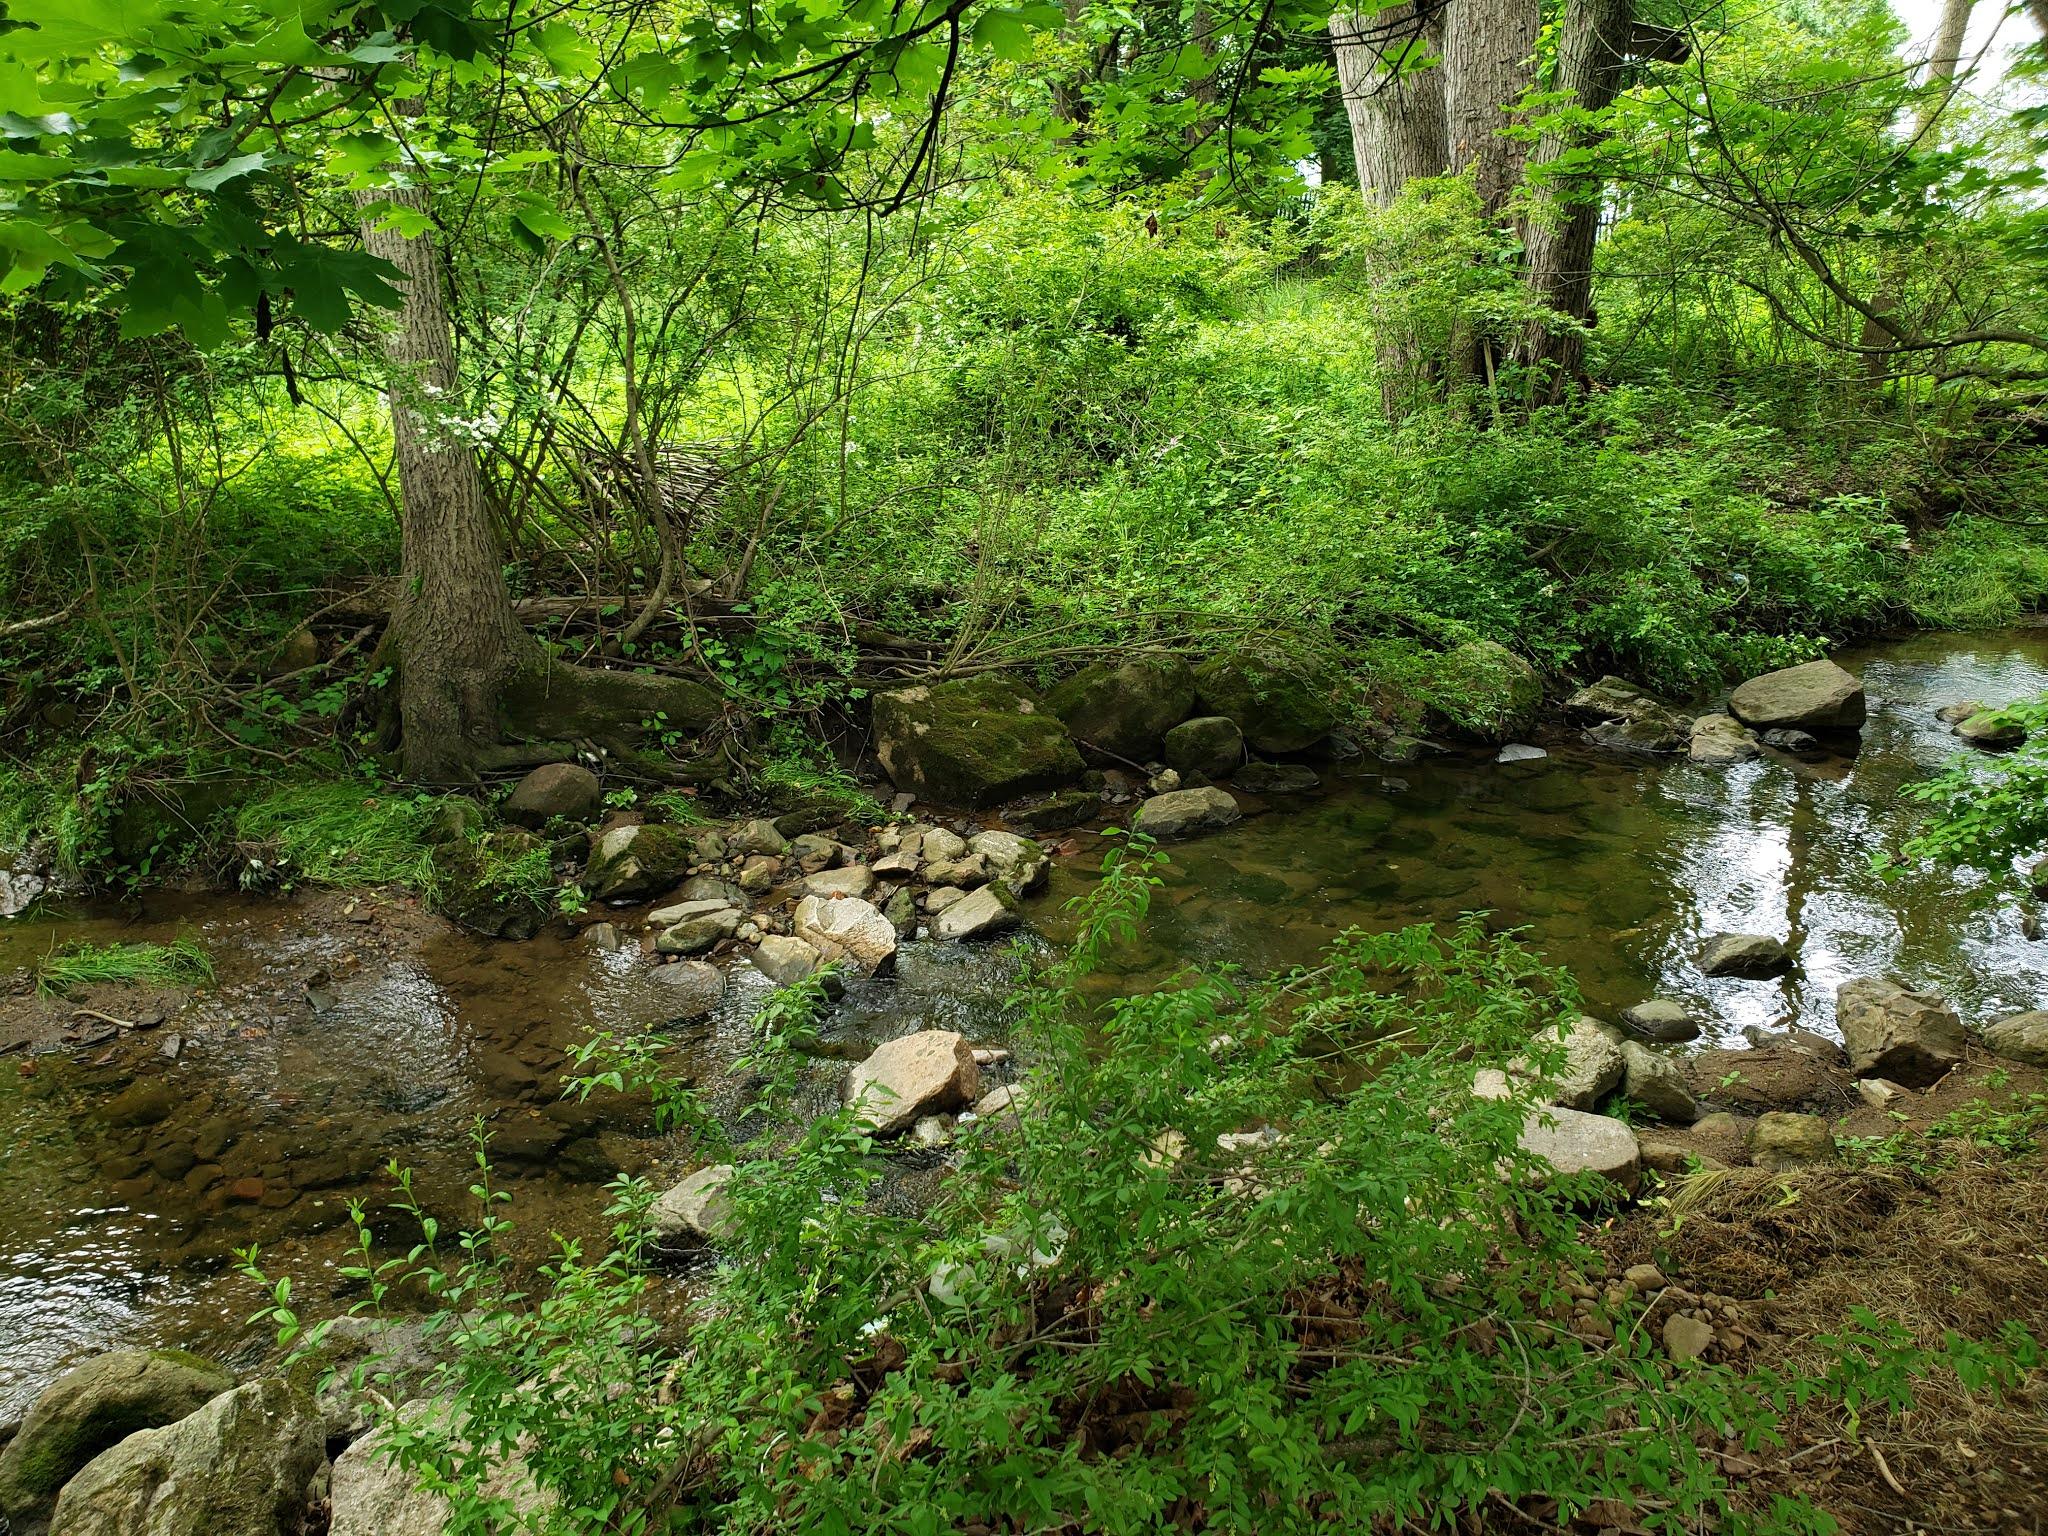 Shabbacong Creek, Shabbacong Mountain Preserve, Washington Borough, Warren County NJ